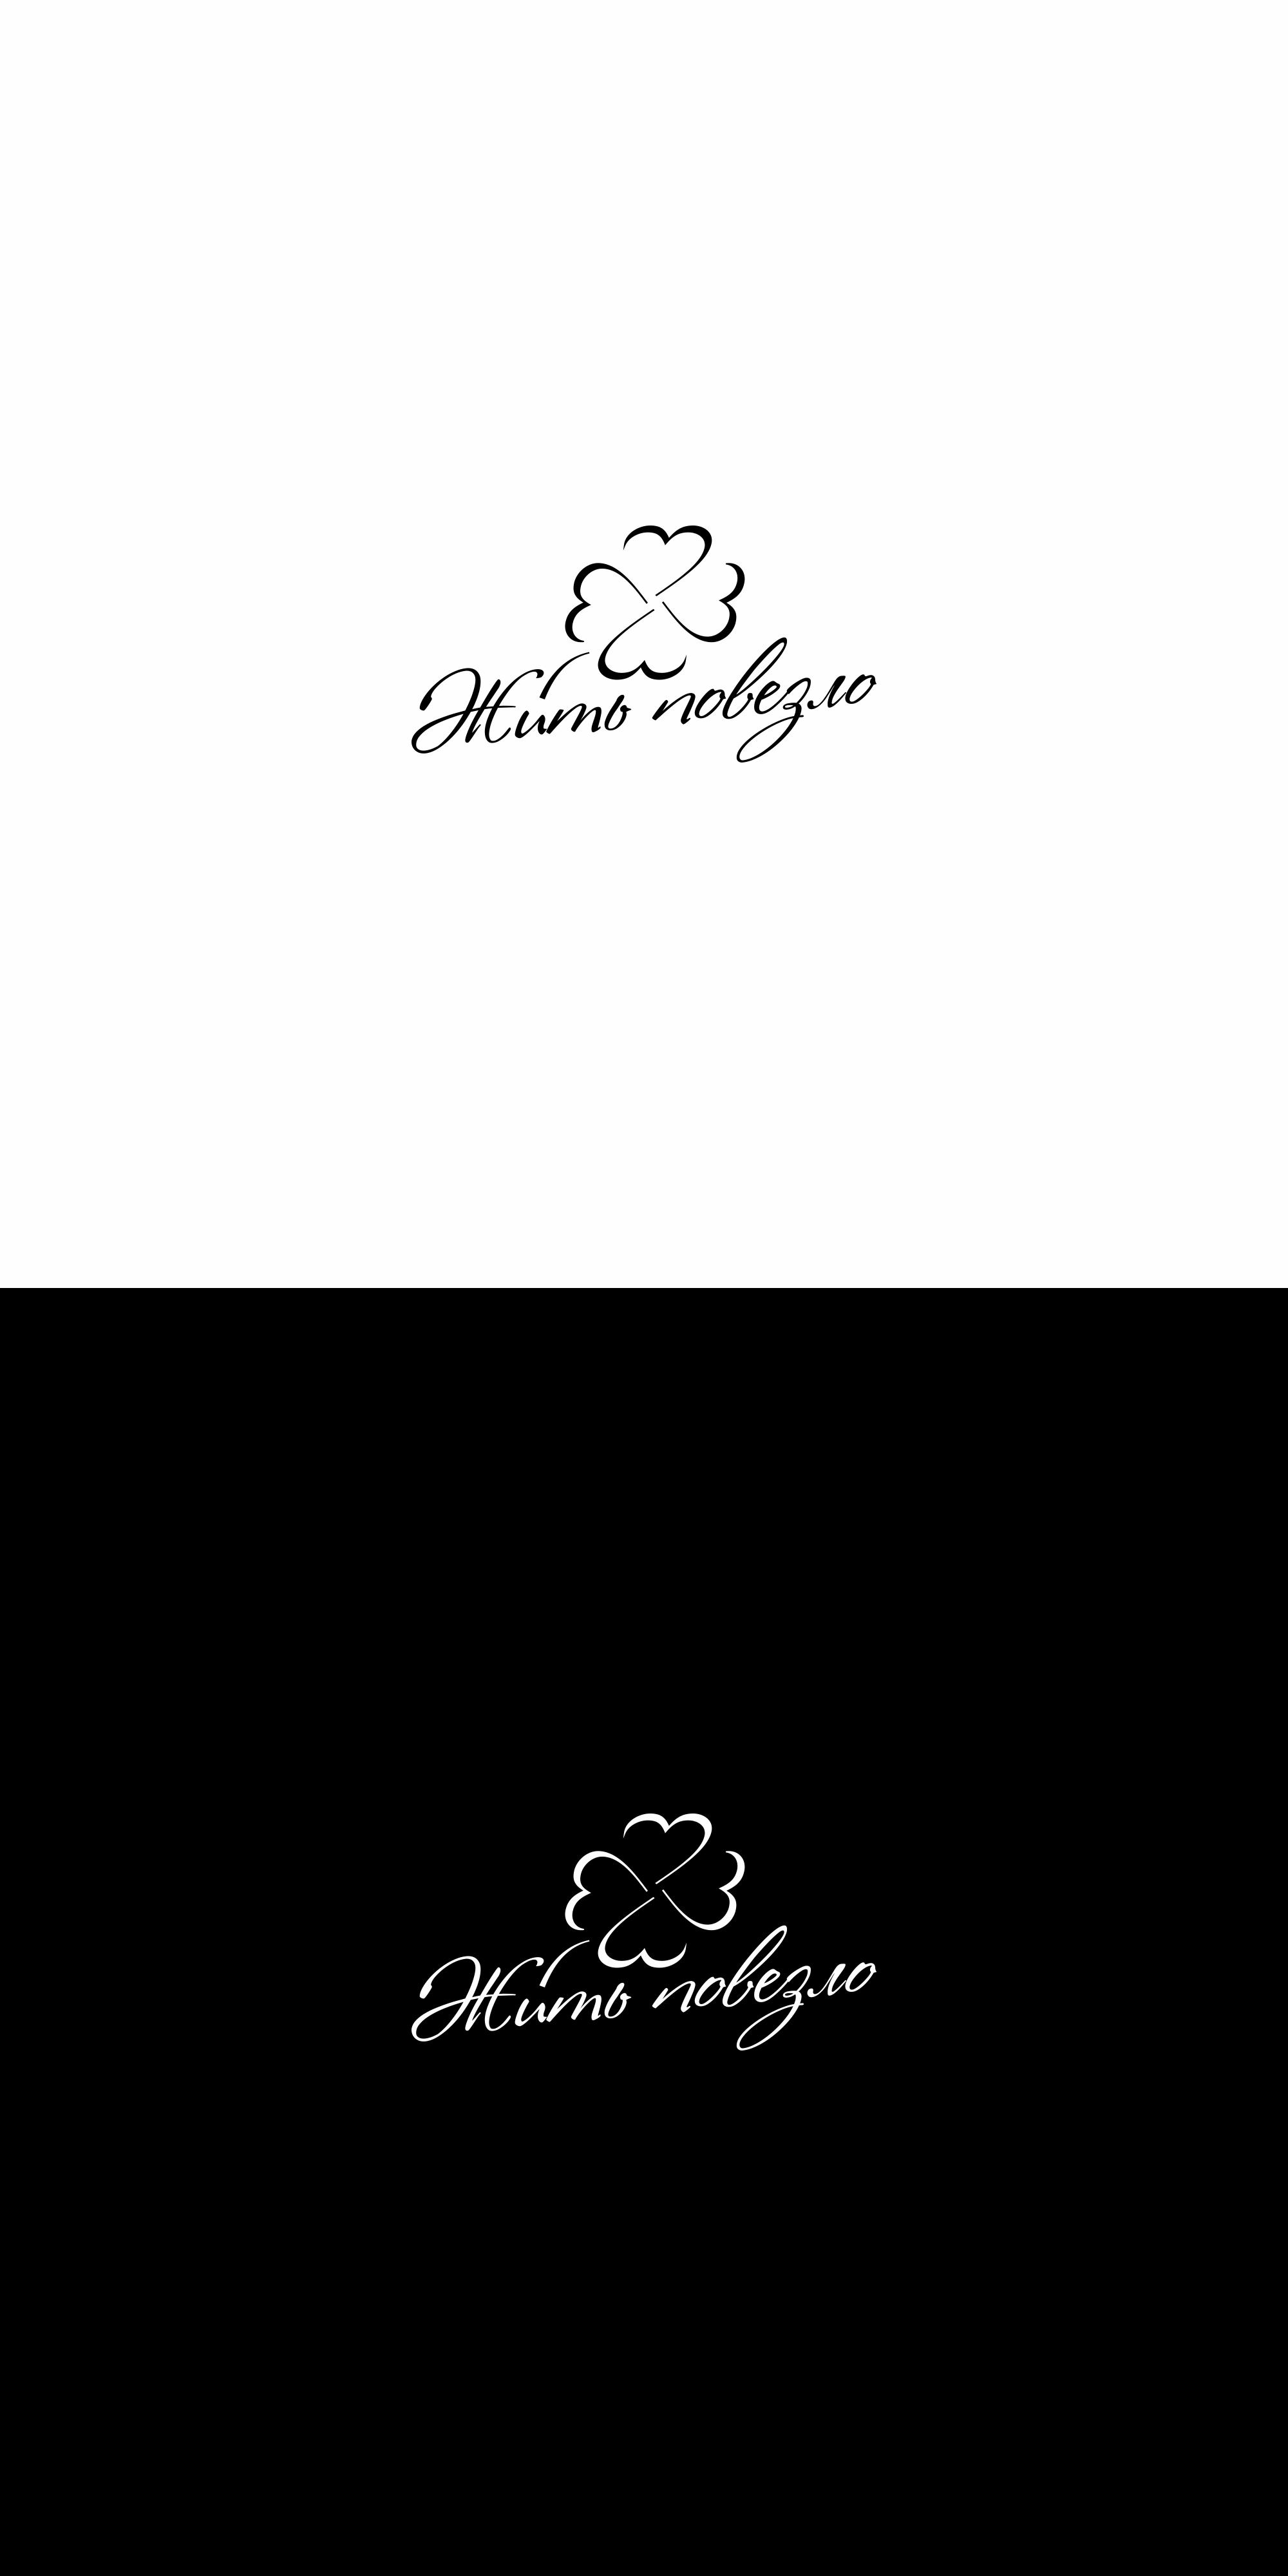 Логотип и фирменный стиль фото f_9975bbf8da39bf12.jpg